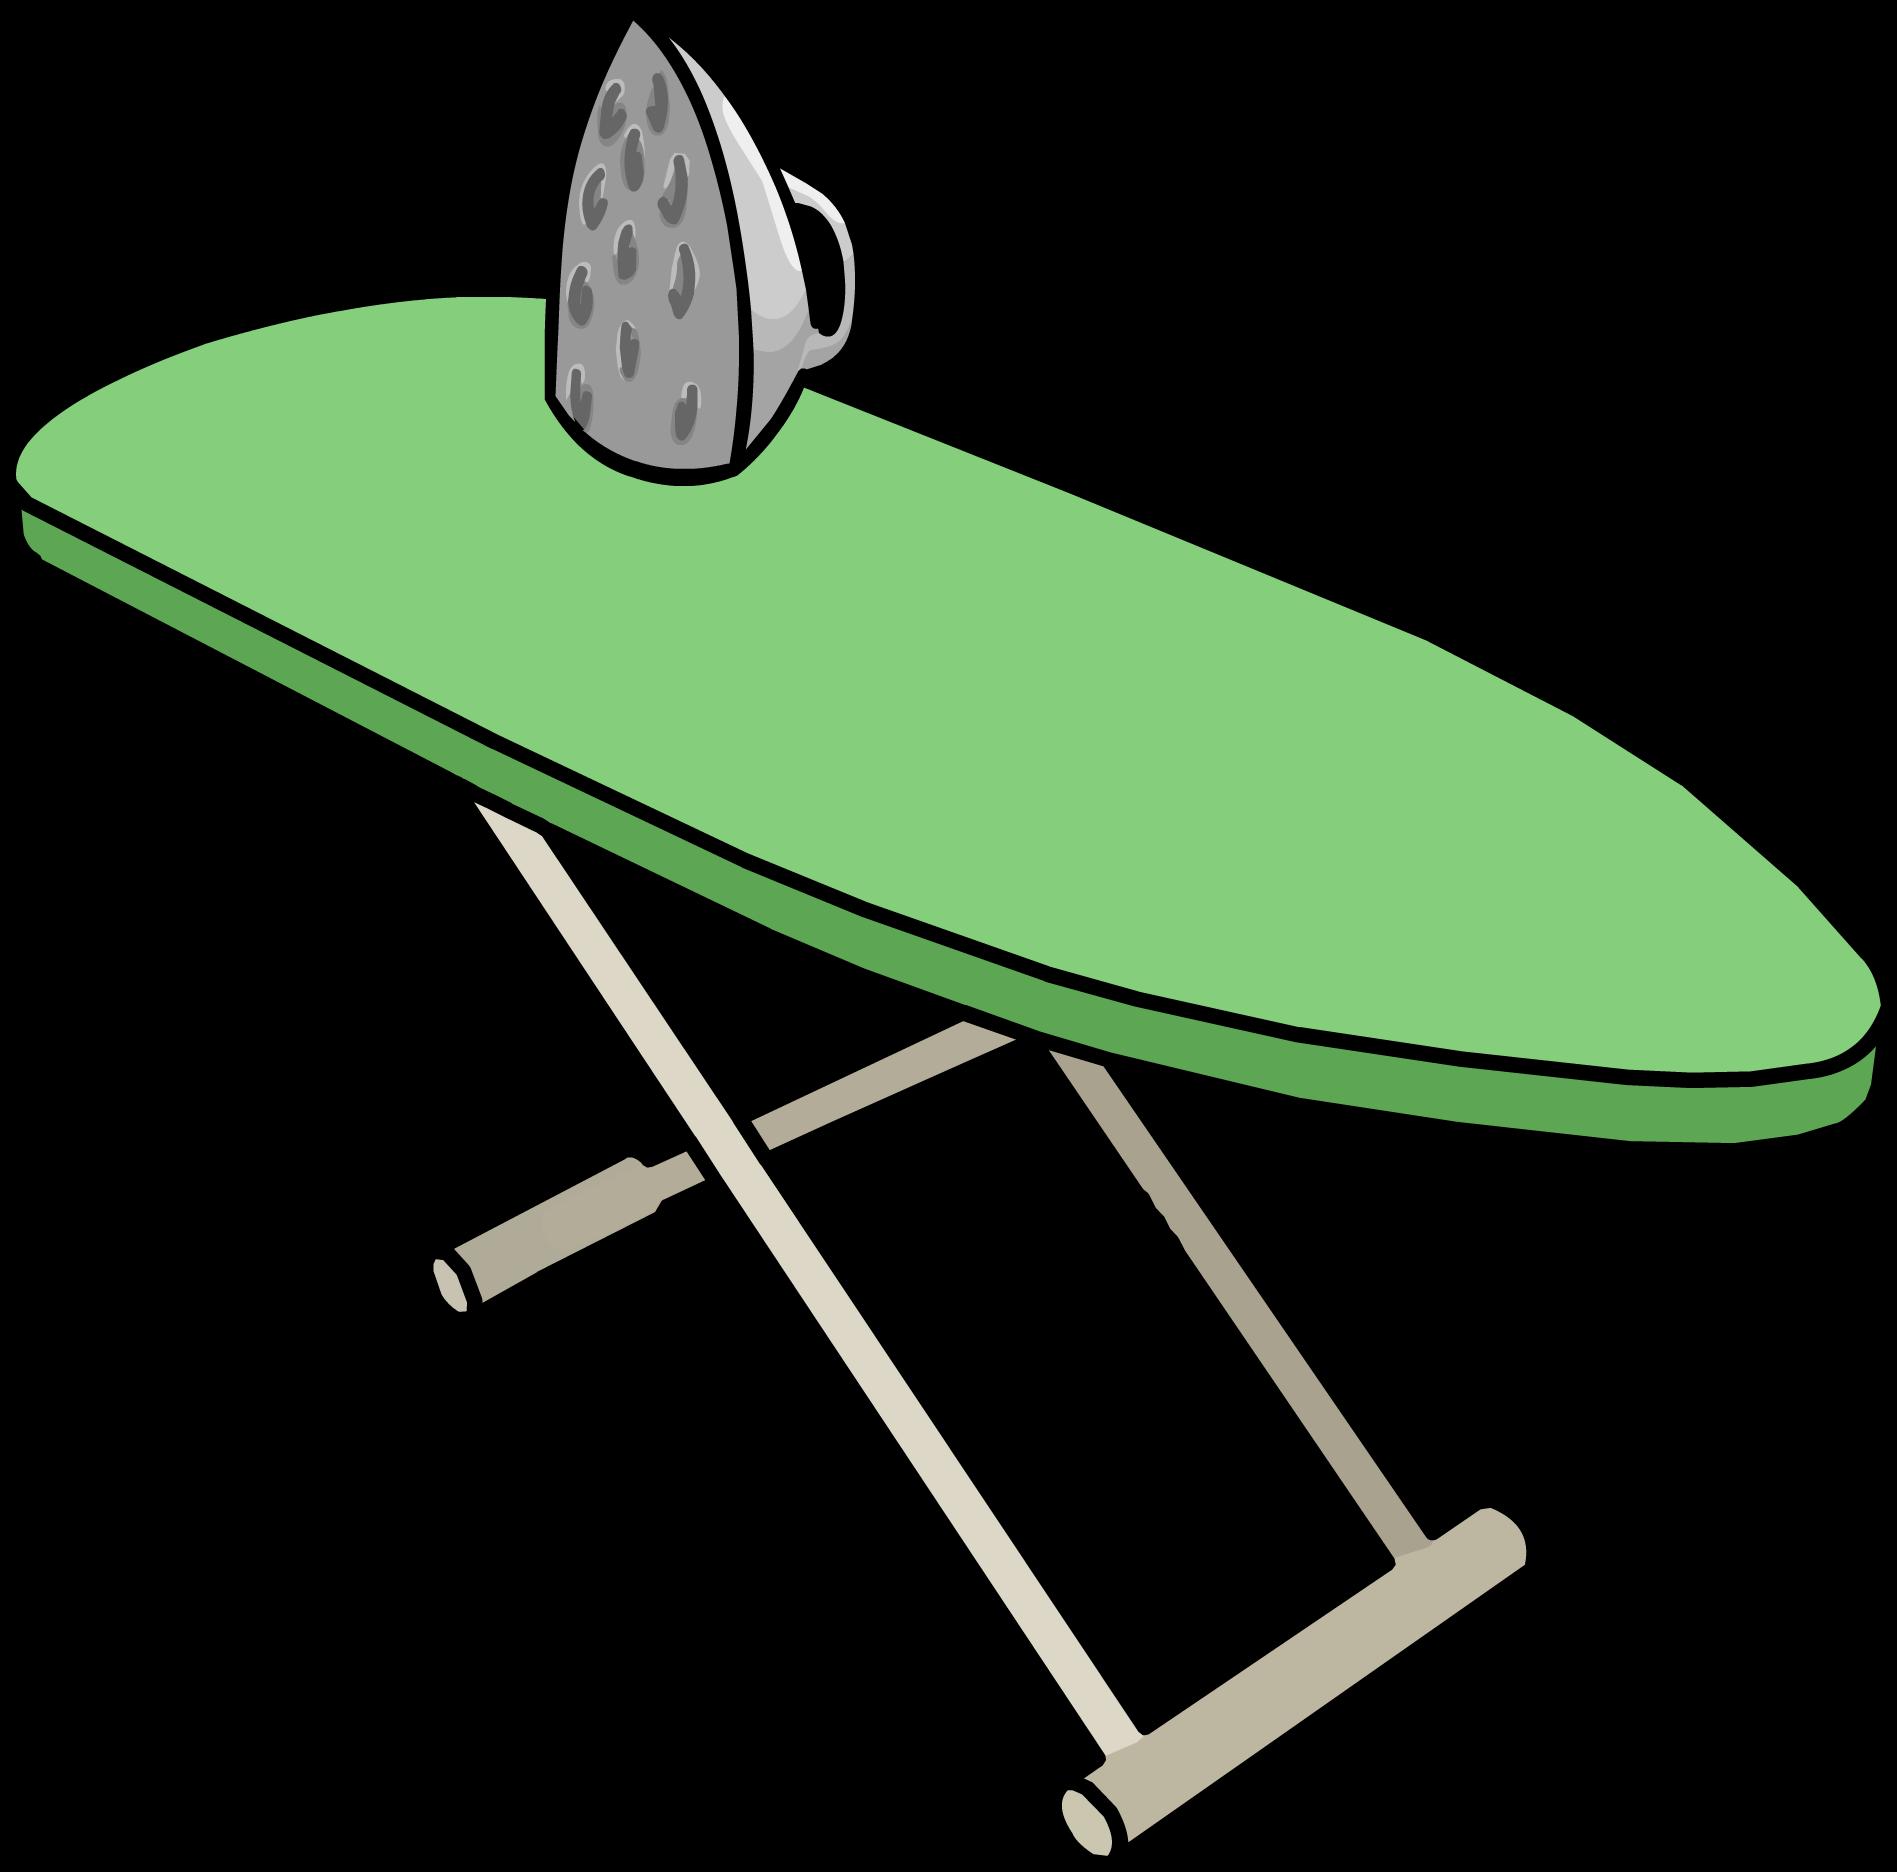 Cartoon Clothes Iron ~ Image ironing board sprite club penguin wiki